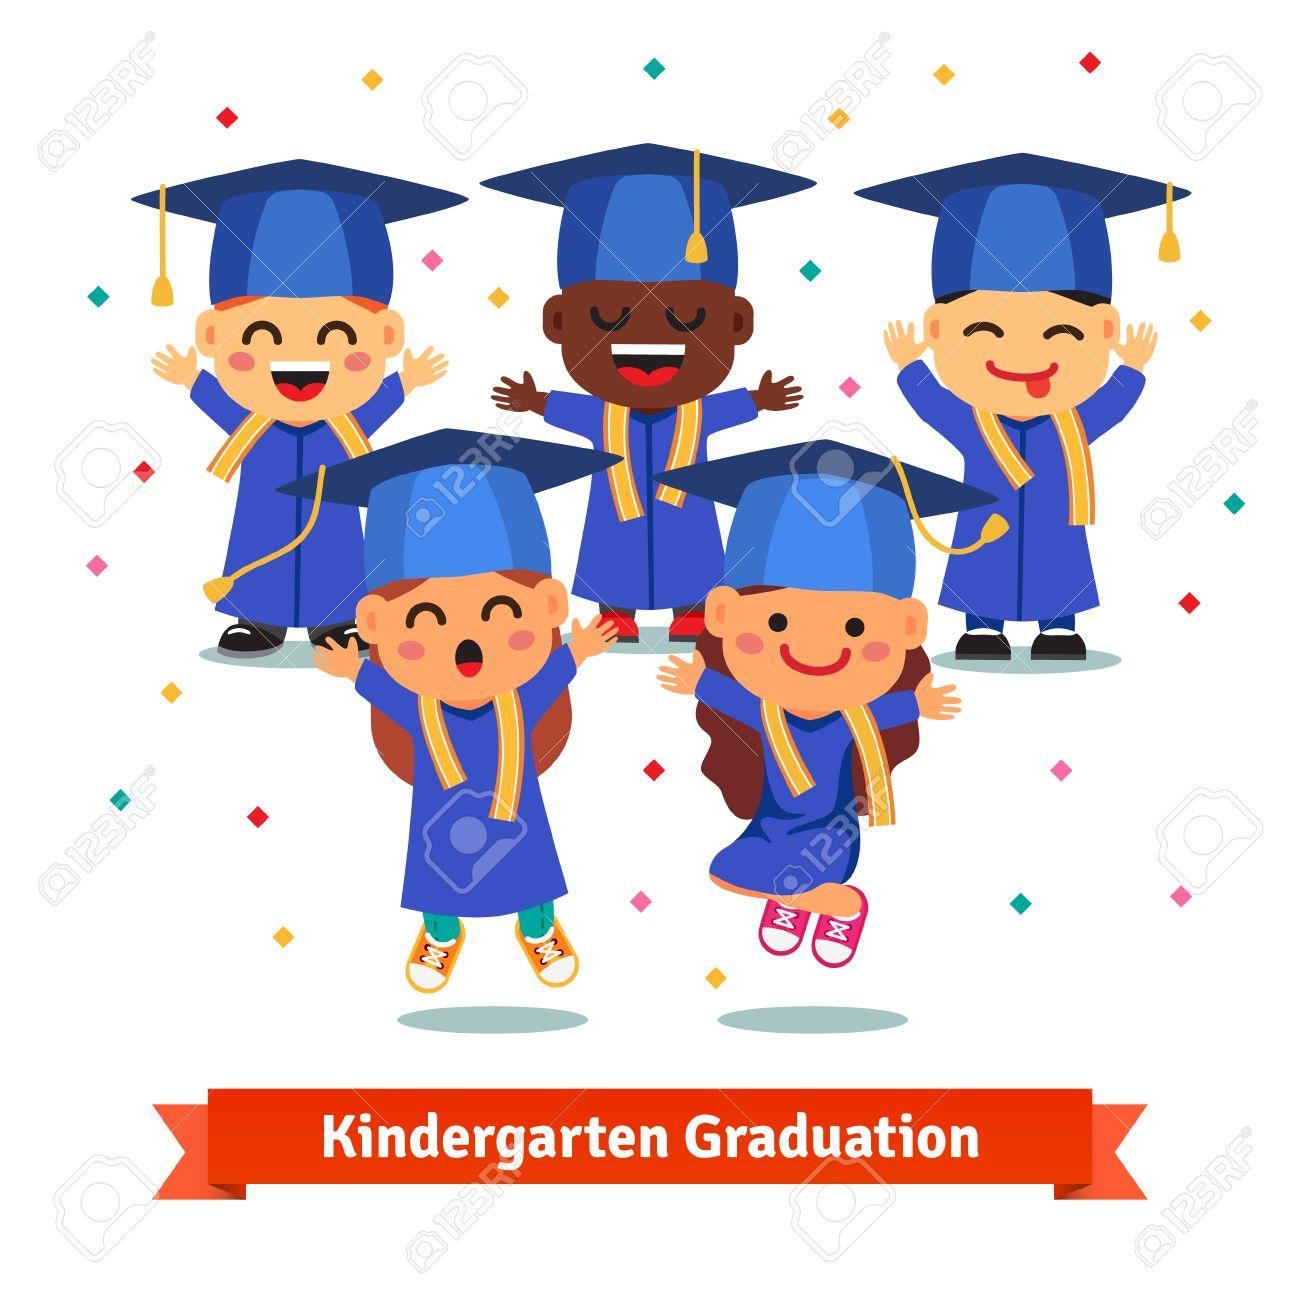 Graduation clipart kindergarden. Kindergarten party station